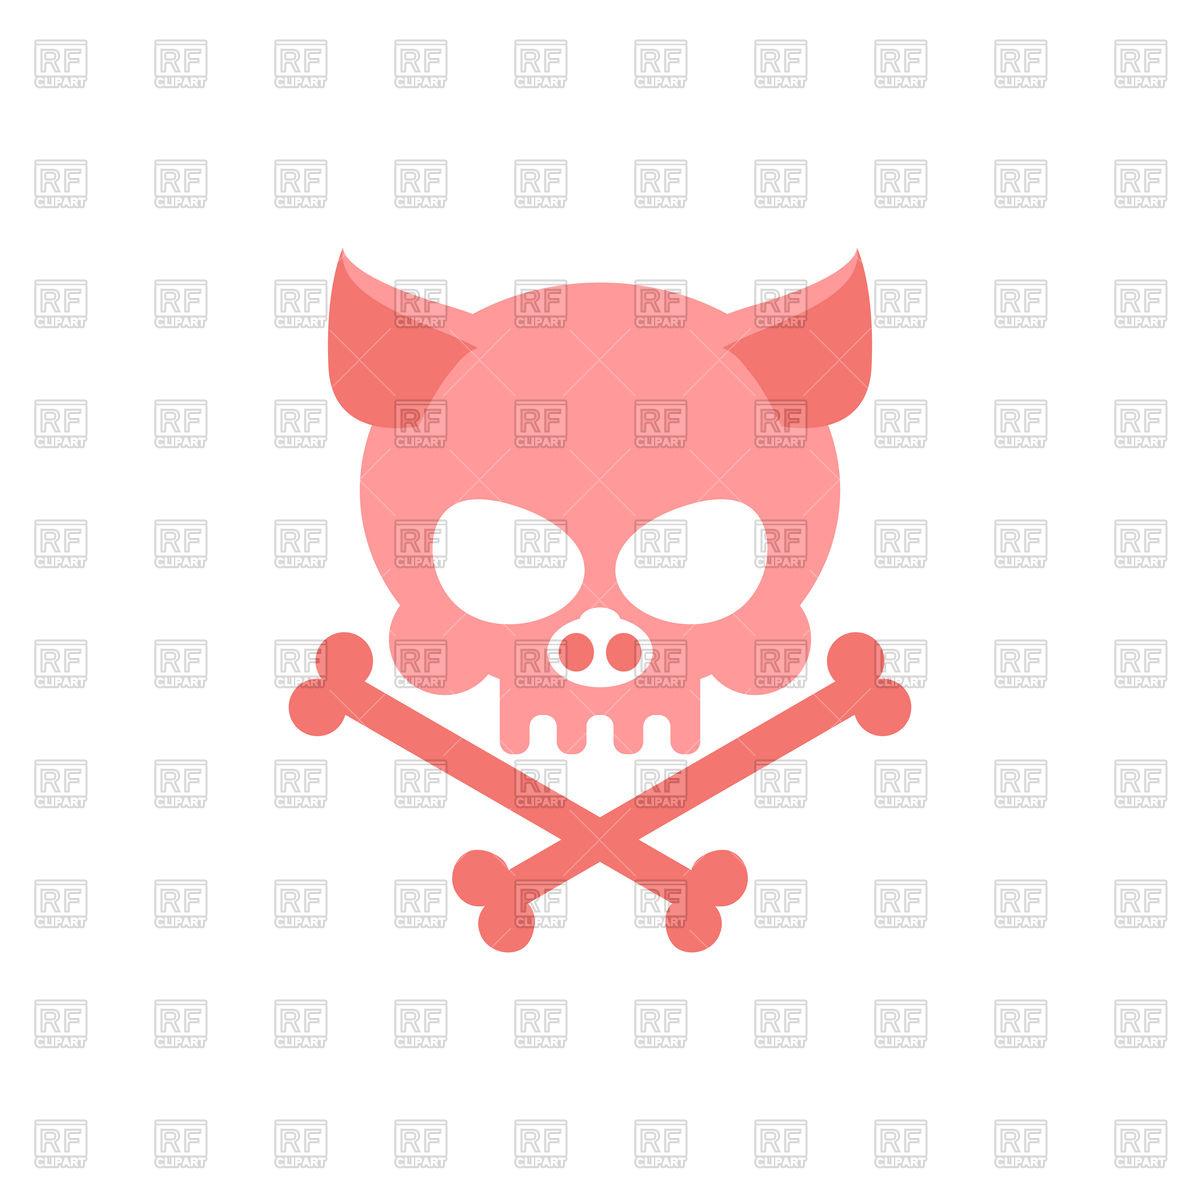 1200x1200 Pig Skull With Bones Royalty Free Vector Clip Art Image